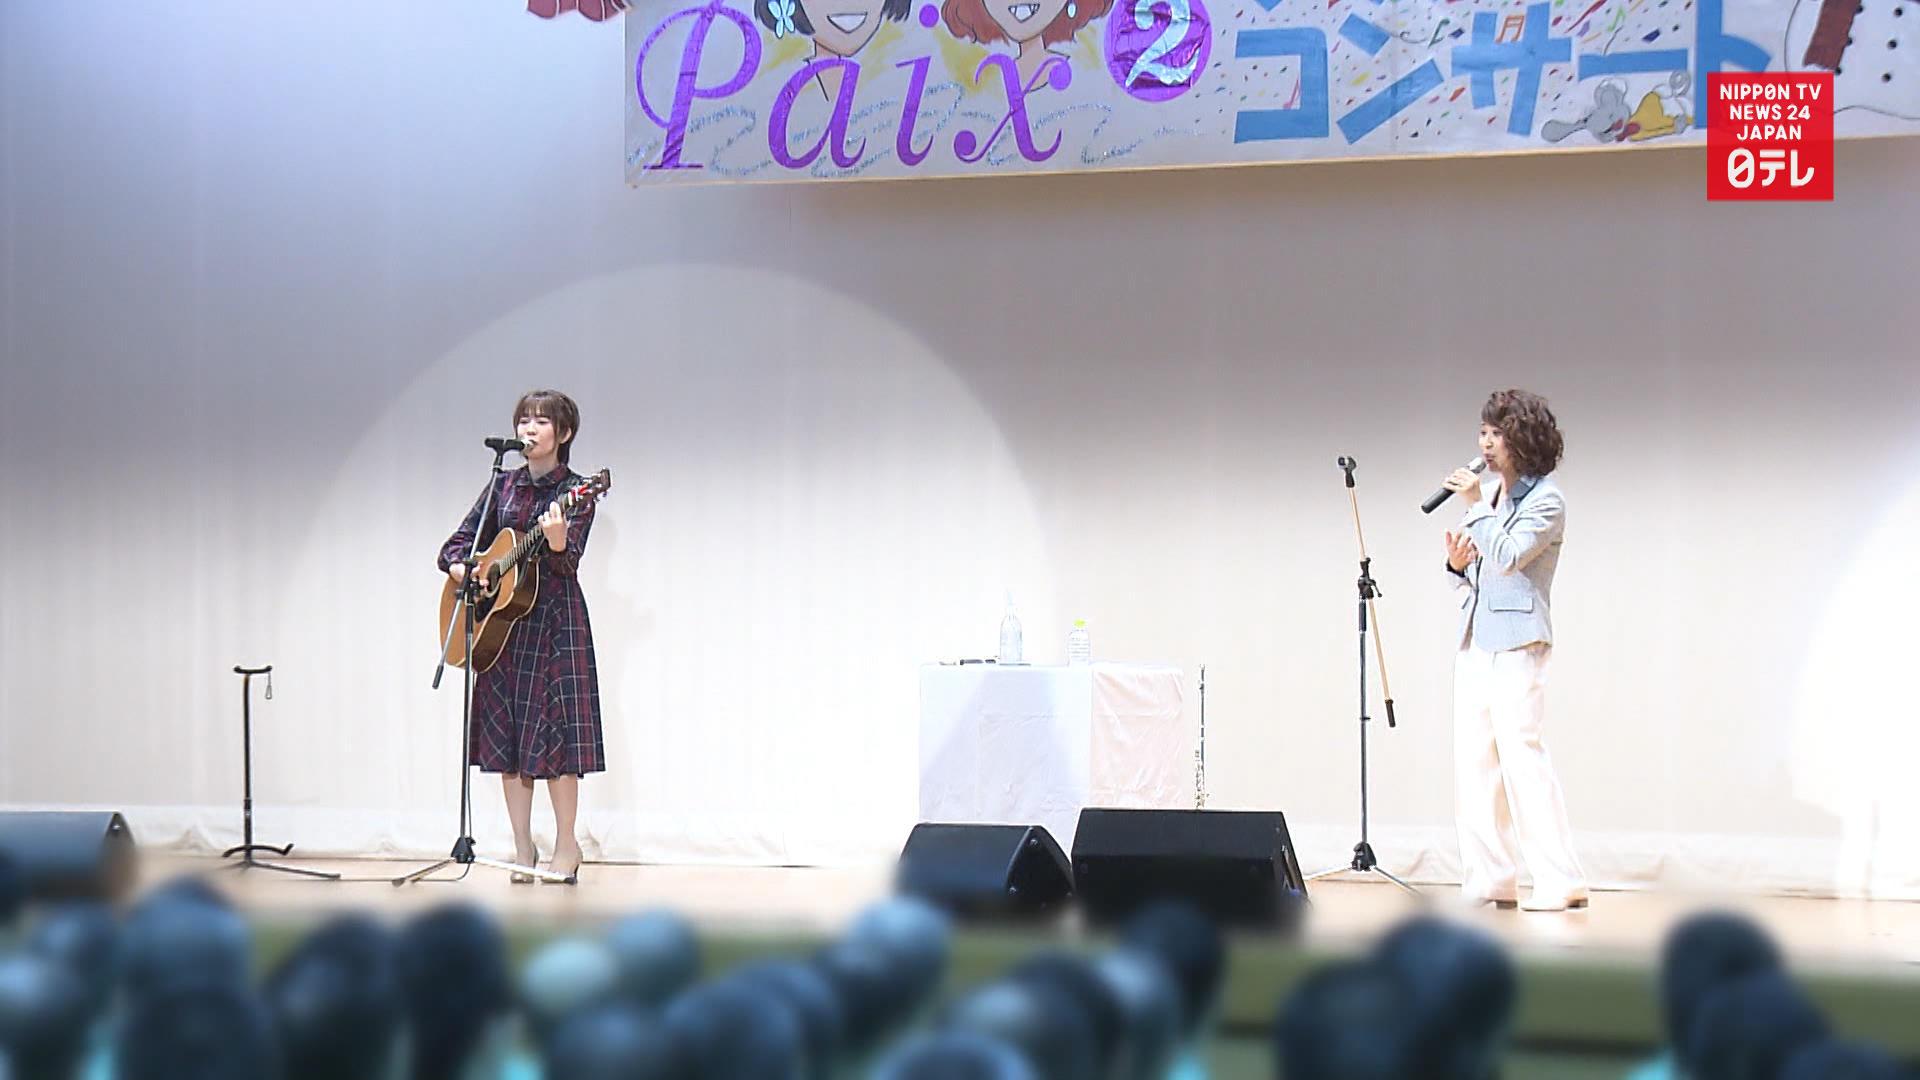 Prison idols sing for inmates